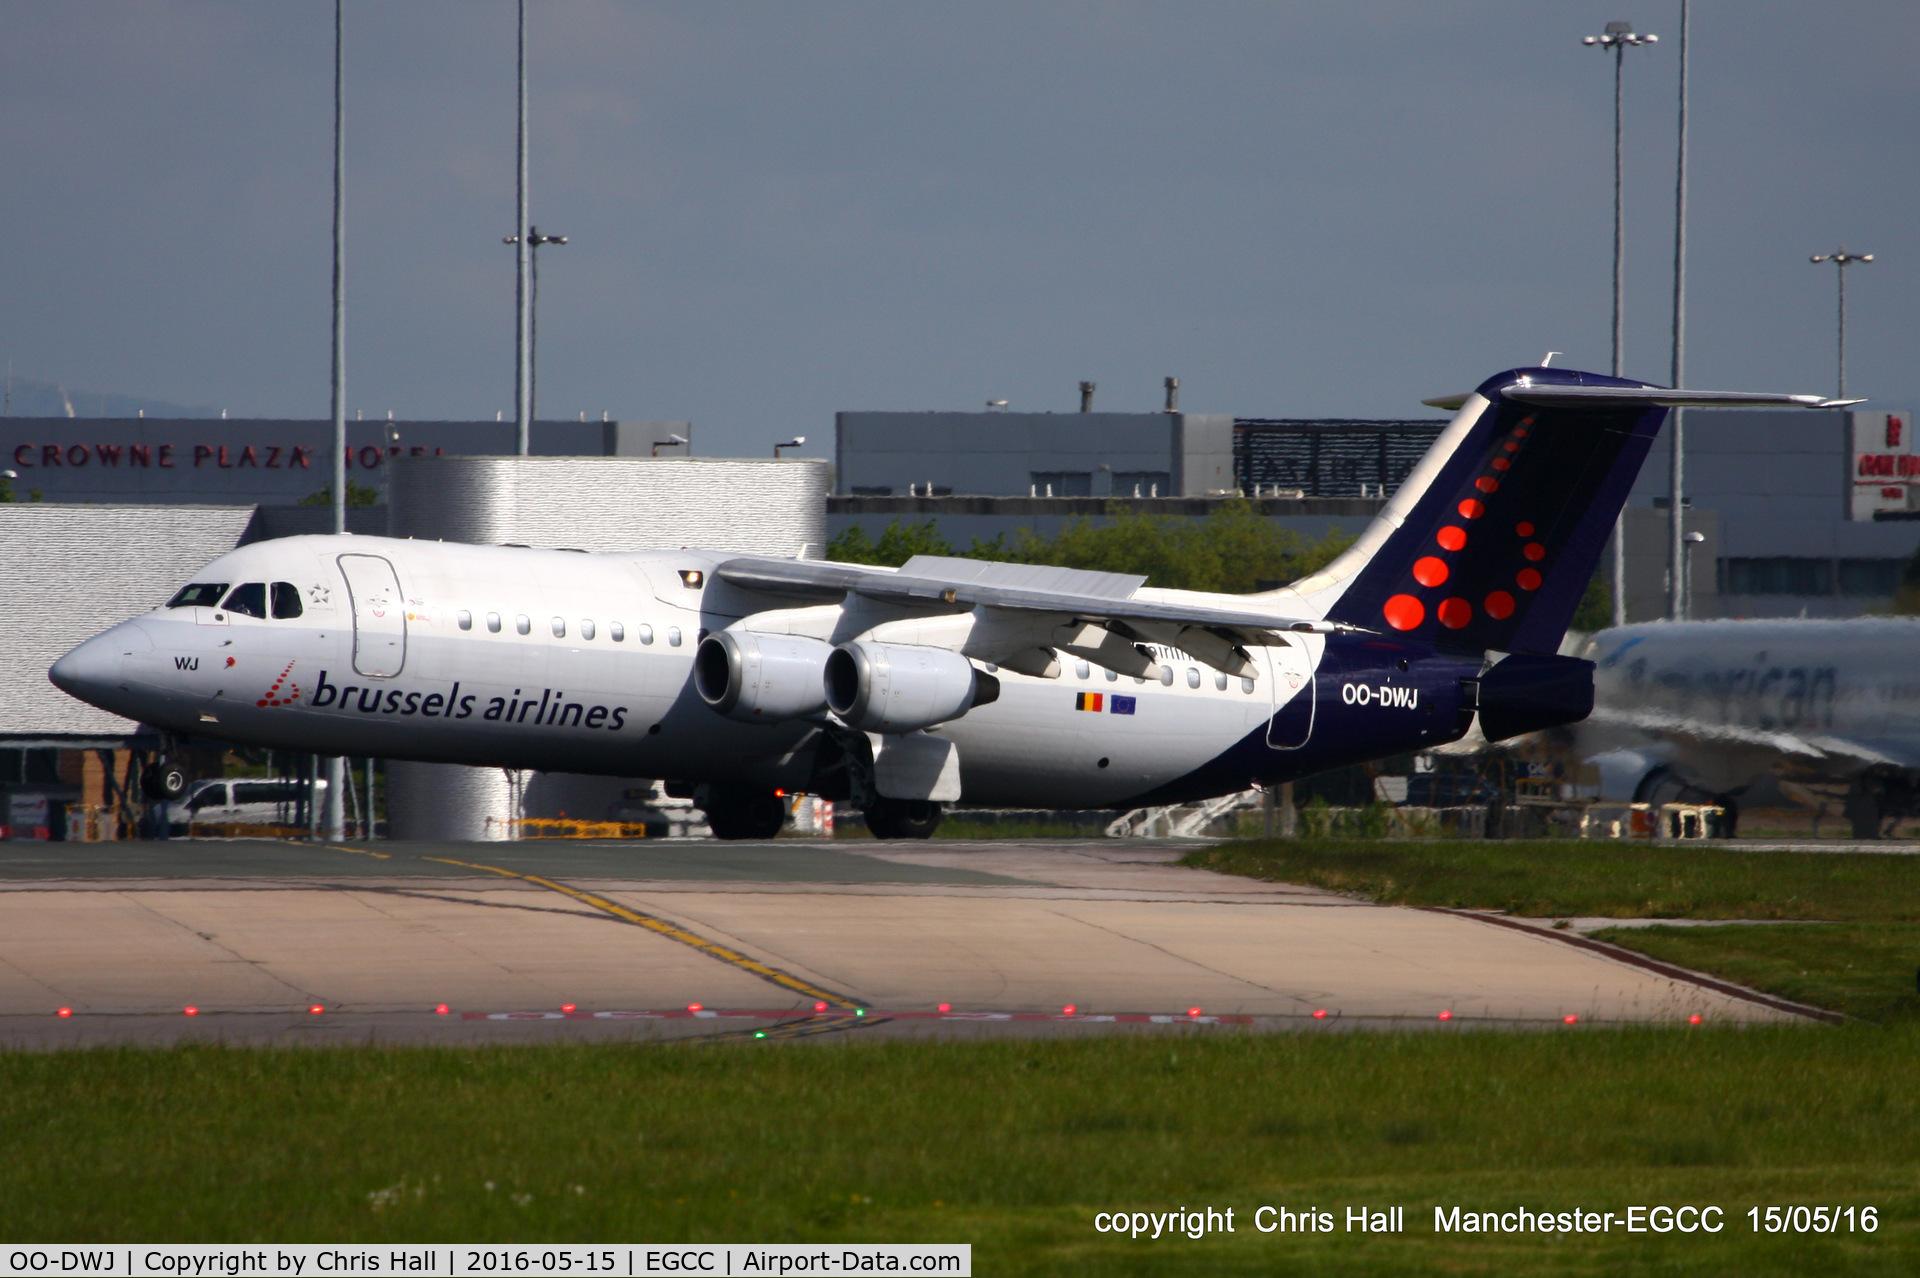 OO-DWJ, 1999 British Aerospace Avro 146-RJ100 C/N E3355, Brussels Airlines